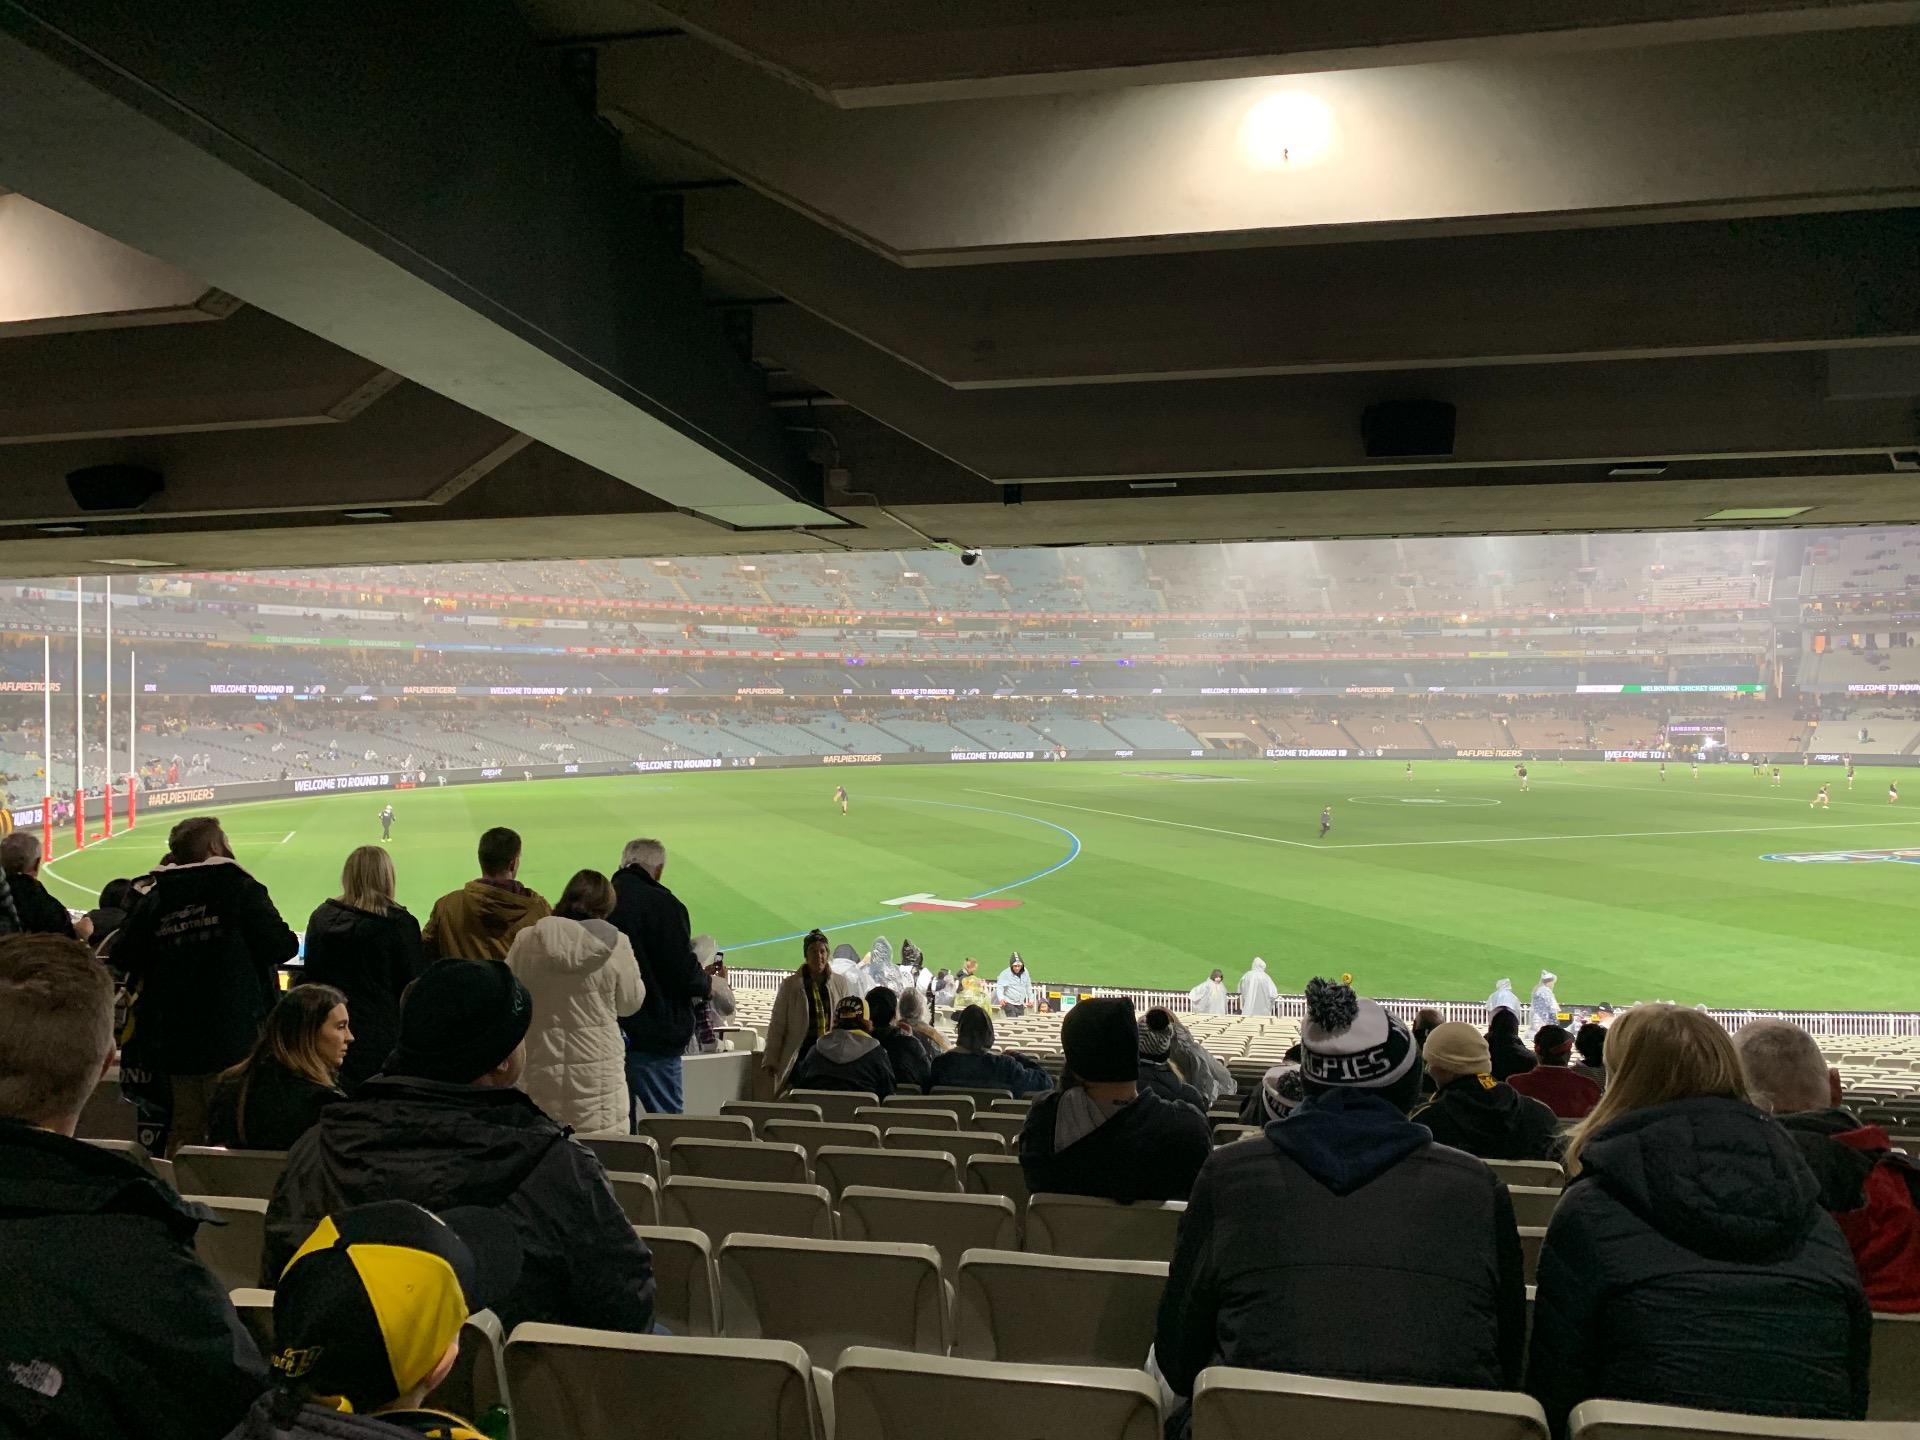 Melbourne Cricket Ground Sección M42 Fila Kk Asiento 11